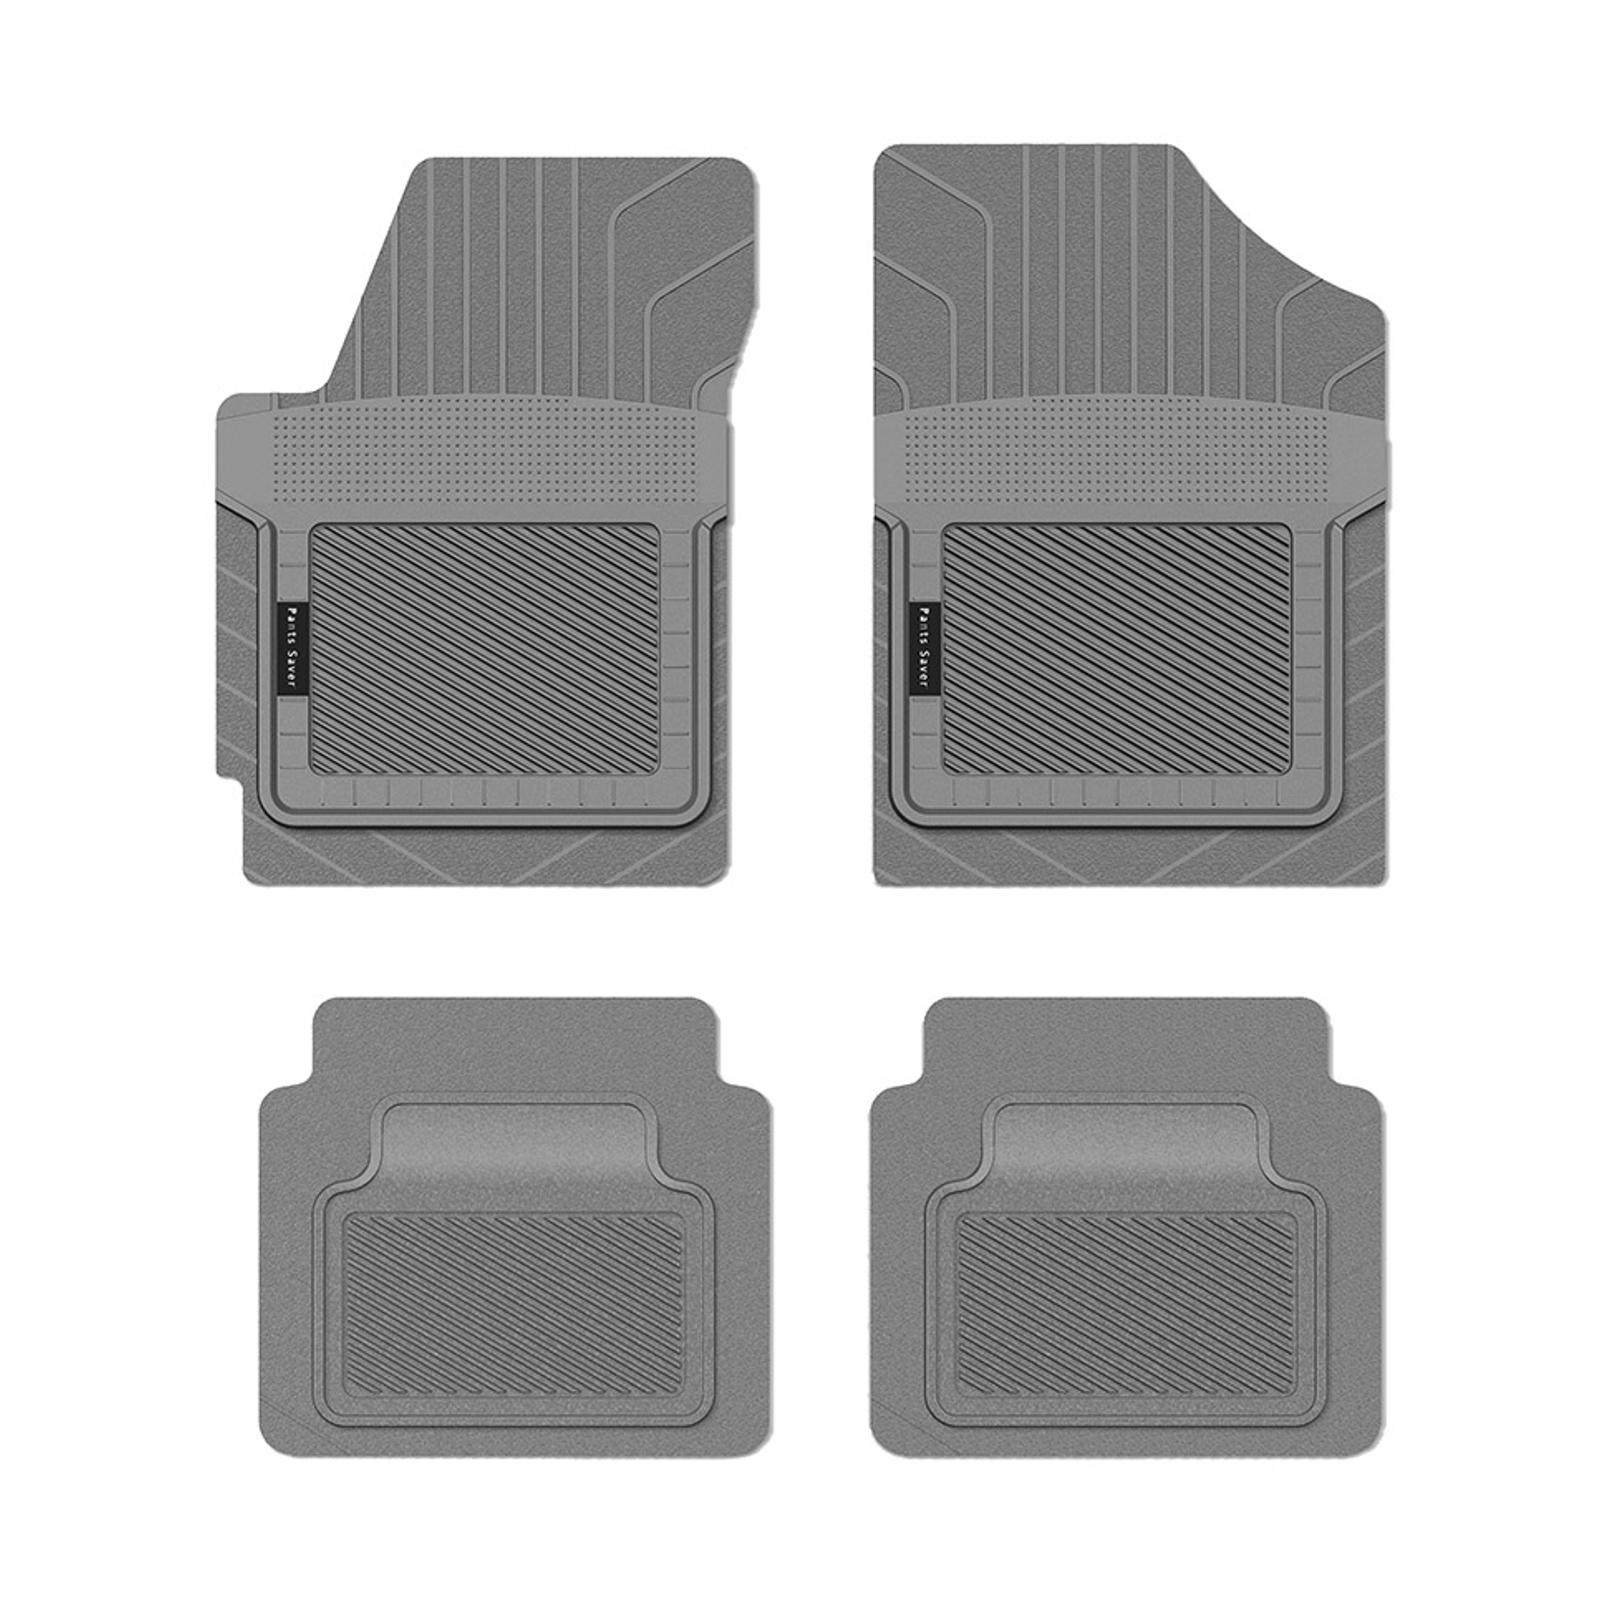 Koolatron Pants Saver Custom Fit Car Mat 4PC NISSAN XTERRA 2004 Tan PartNumber: 02841301000P KsnValue: 082V009221162000 MfgPartNumber: 2922043